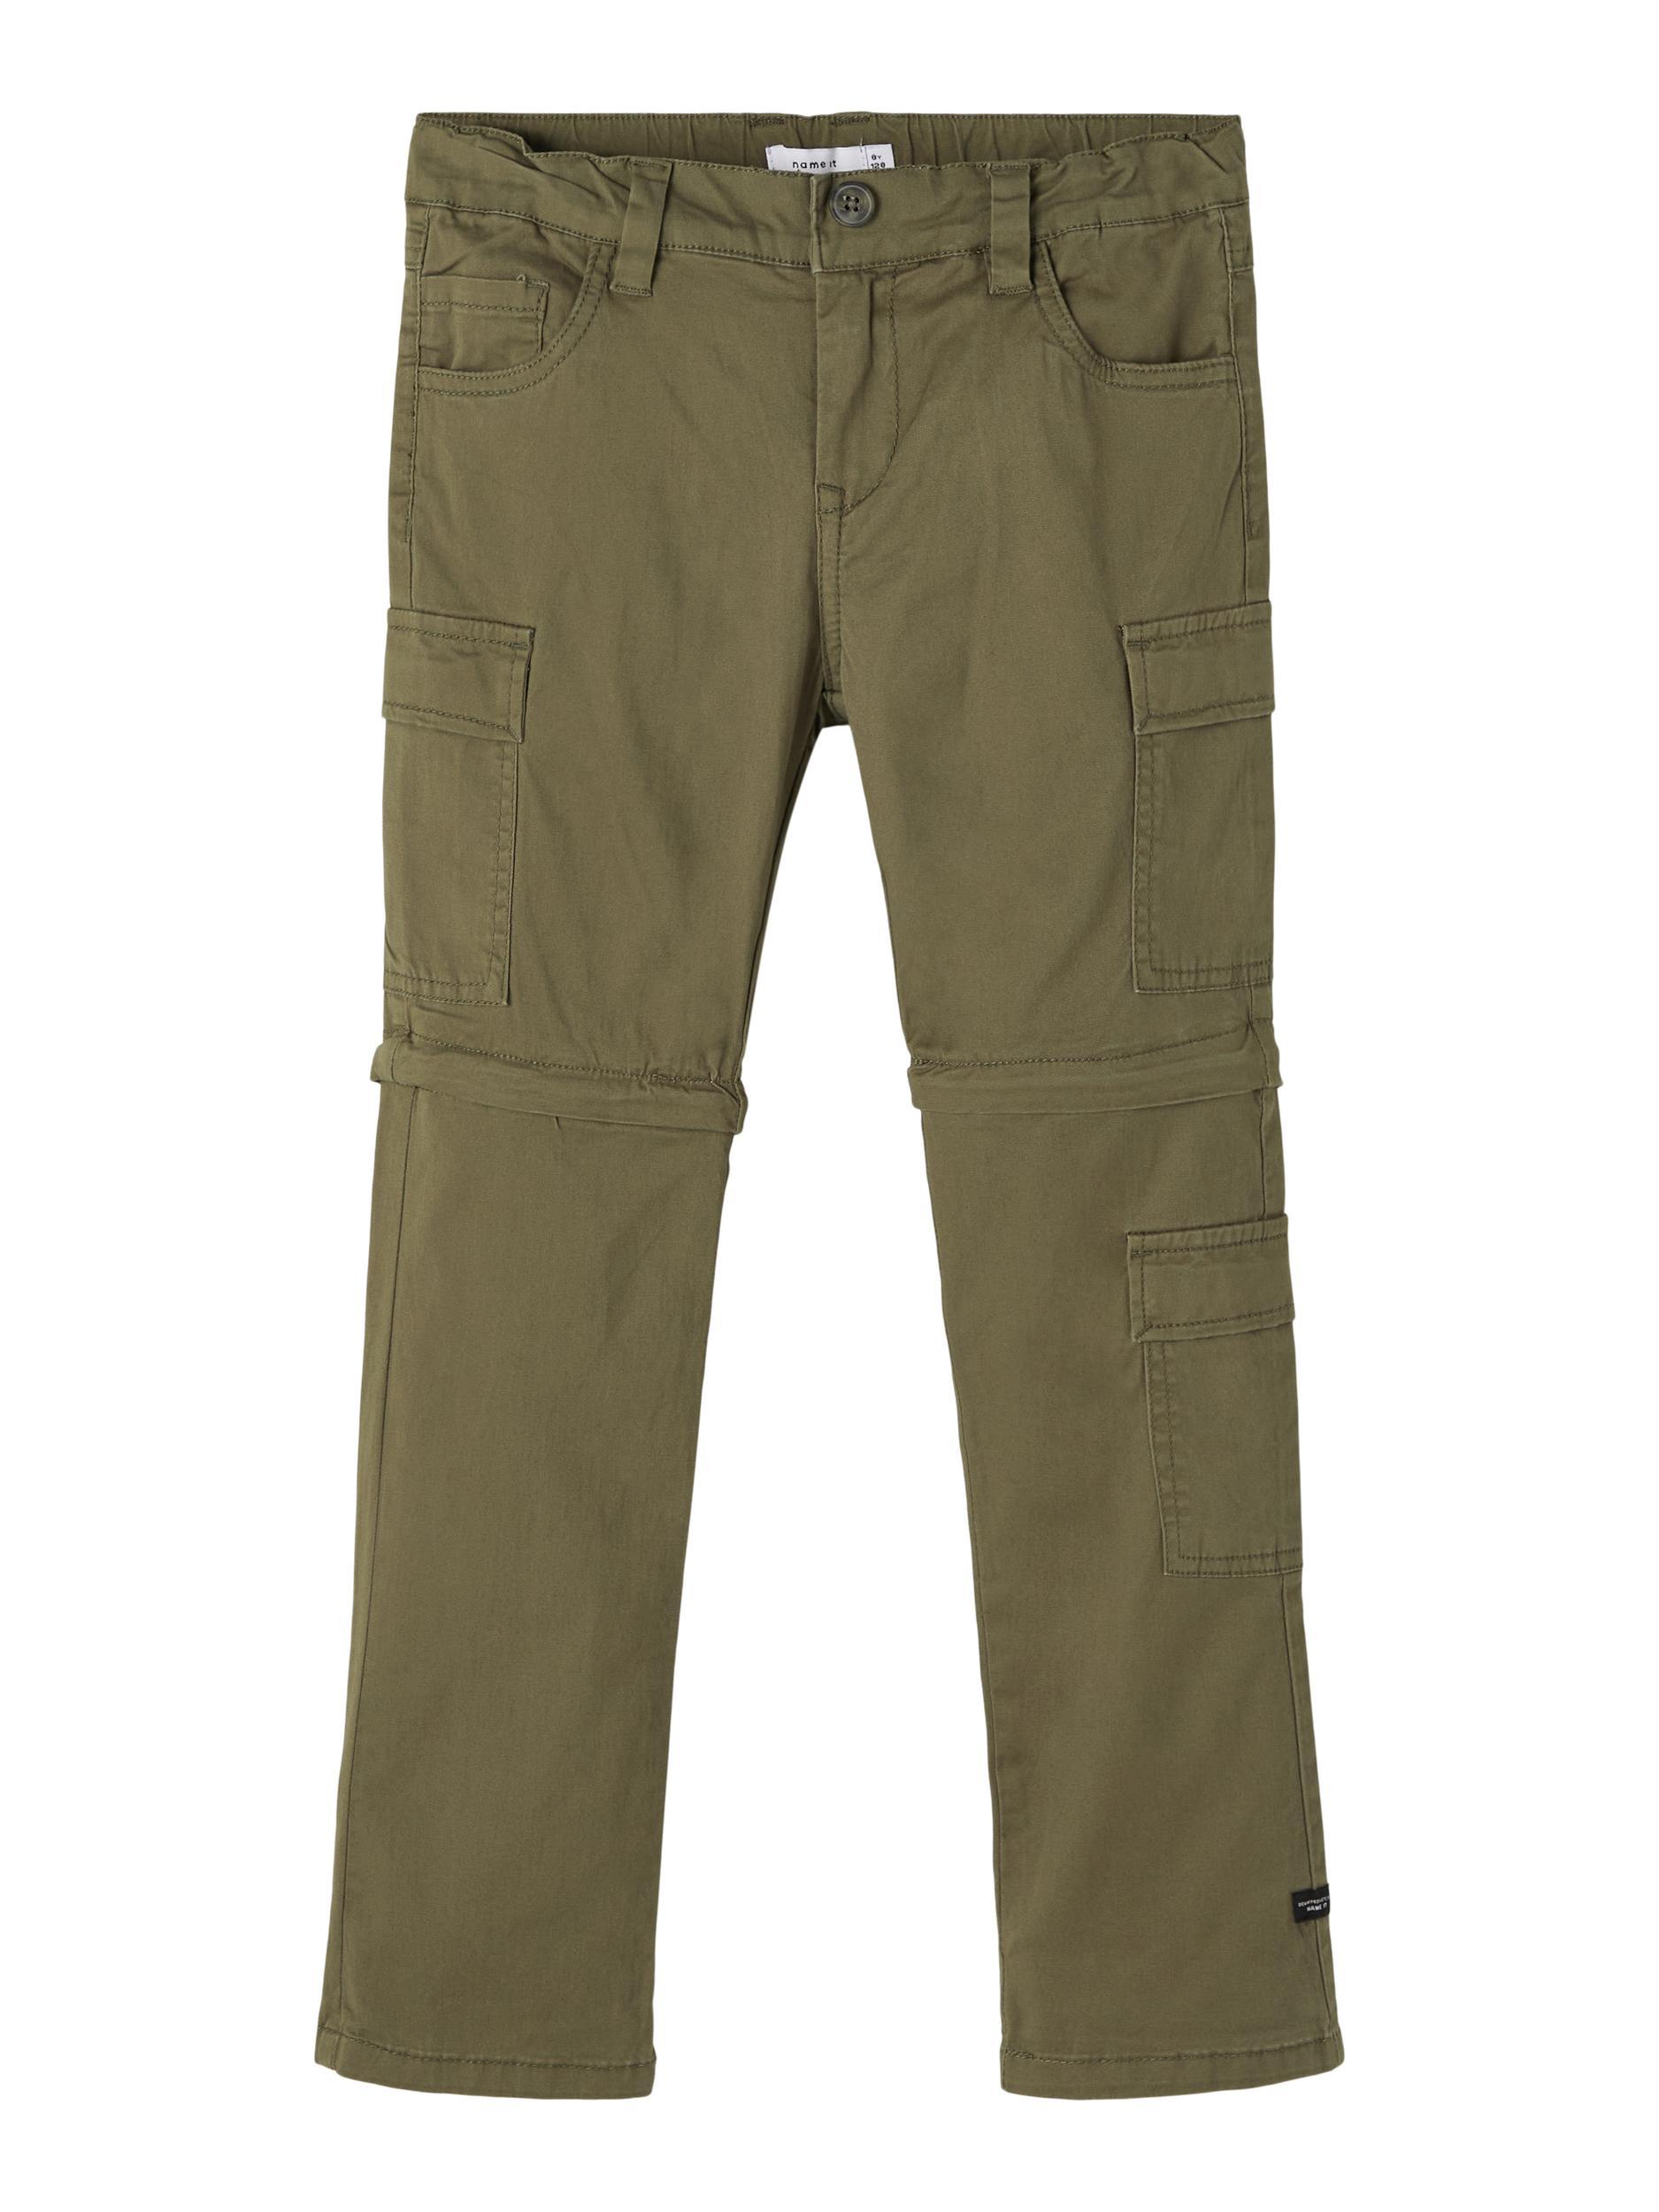 Name It Barry zip-off pants, ivy green, 128